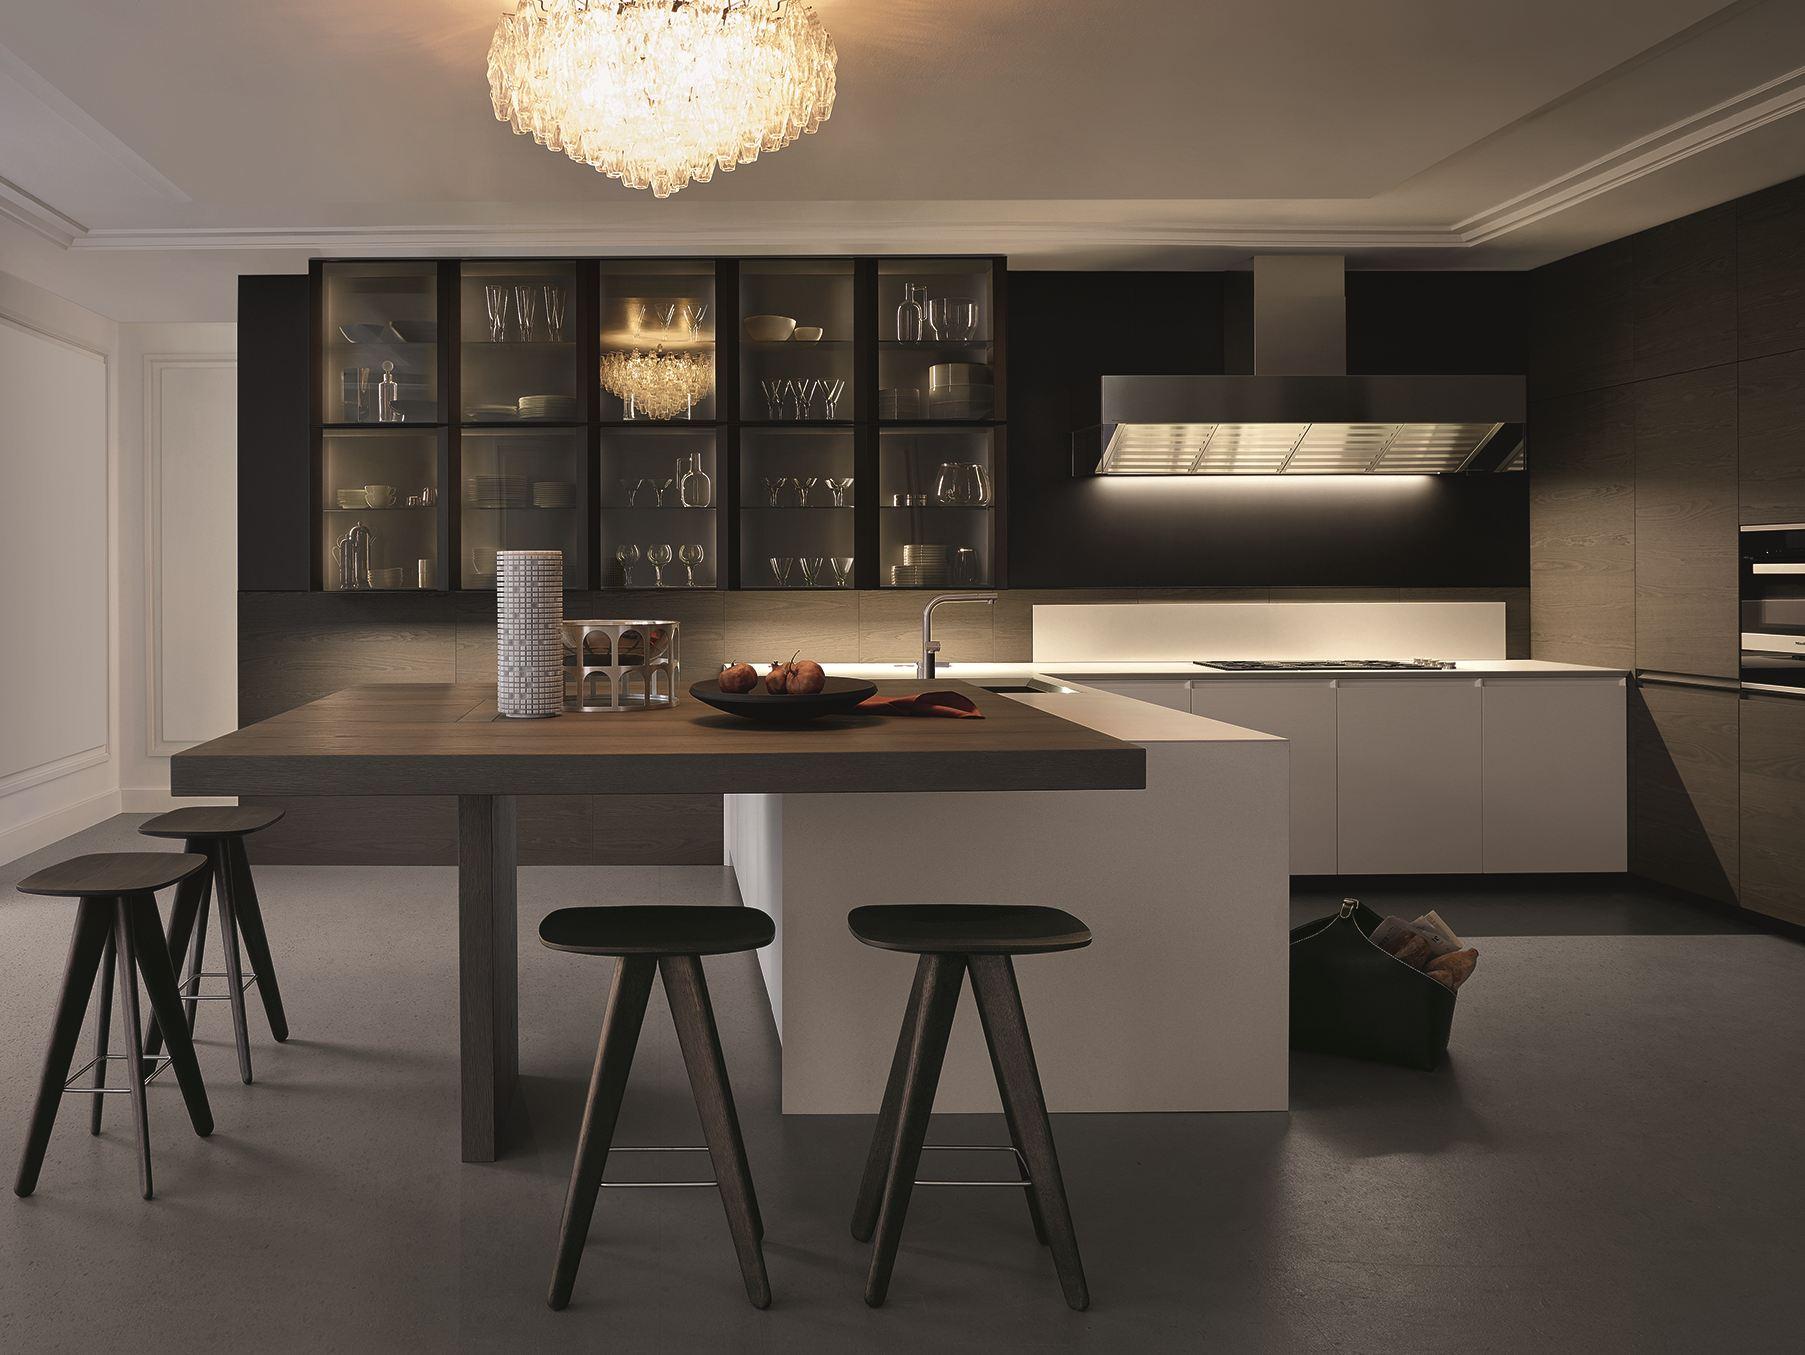 Kitchens Archivos Wwwgunnitrentinoes - Varenna cuisine